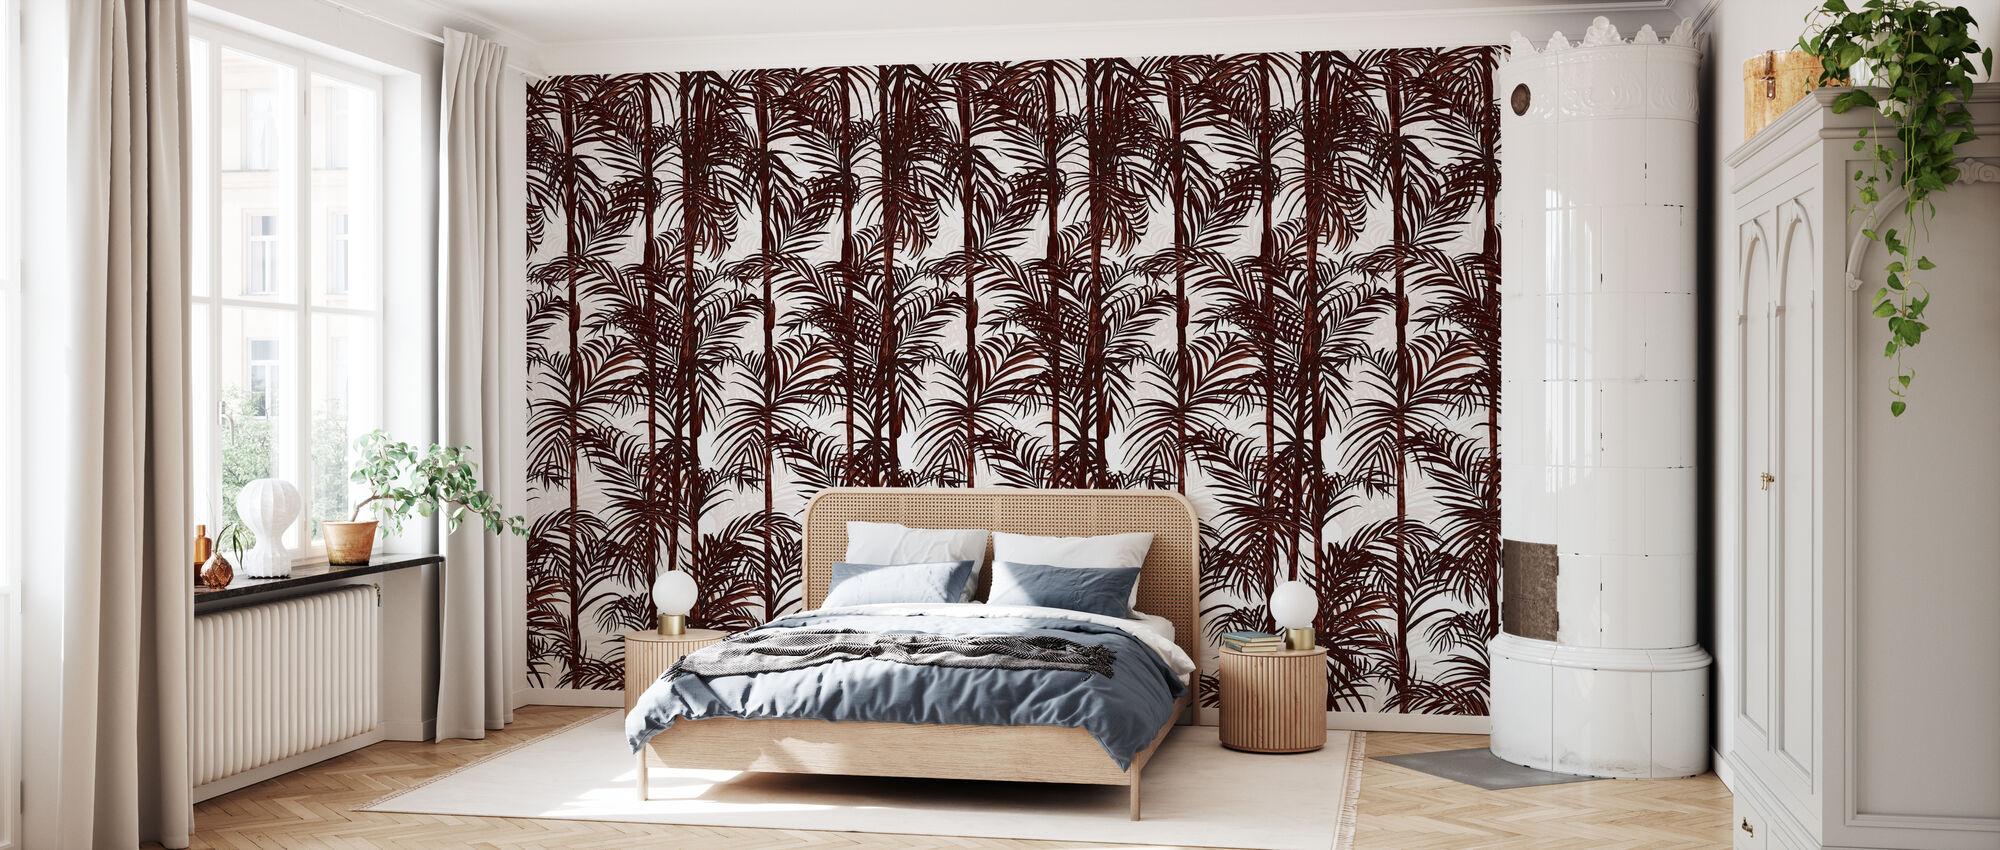 Botany Bamboo - Deep Red - Wallpaper - Bedroom